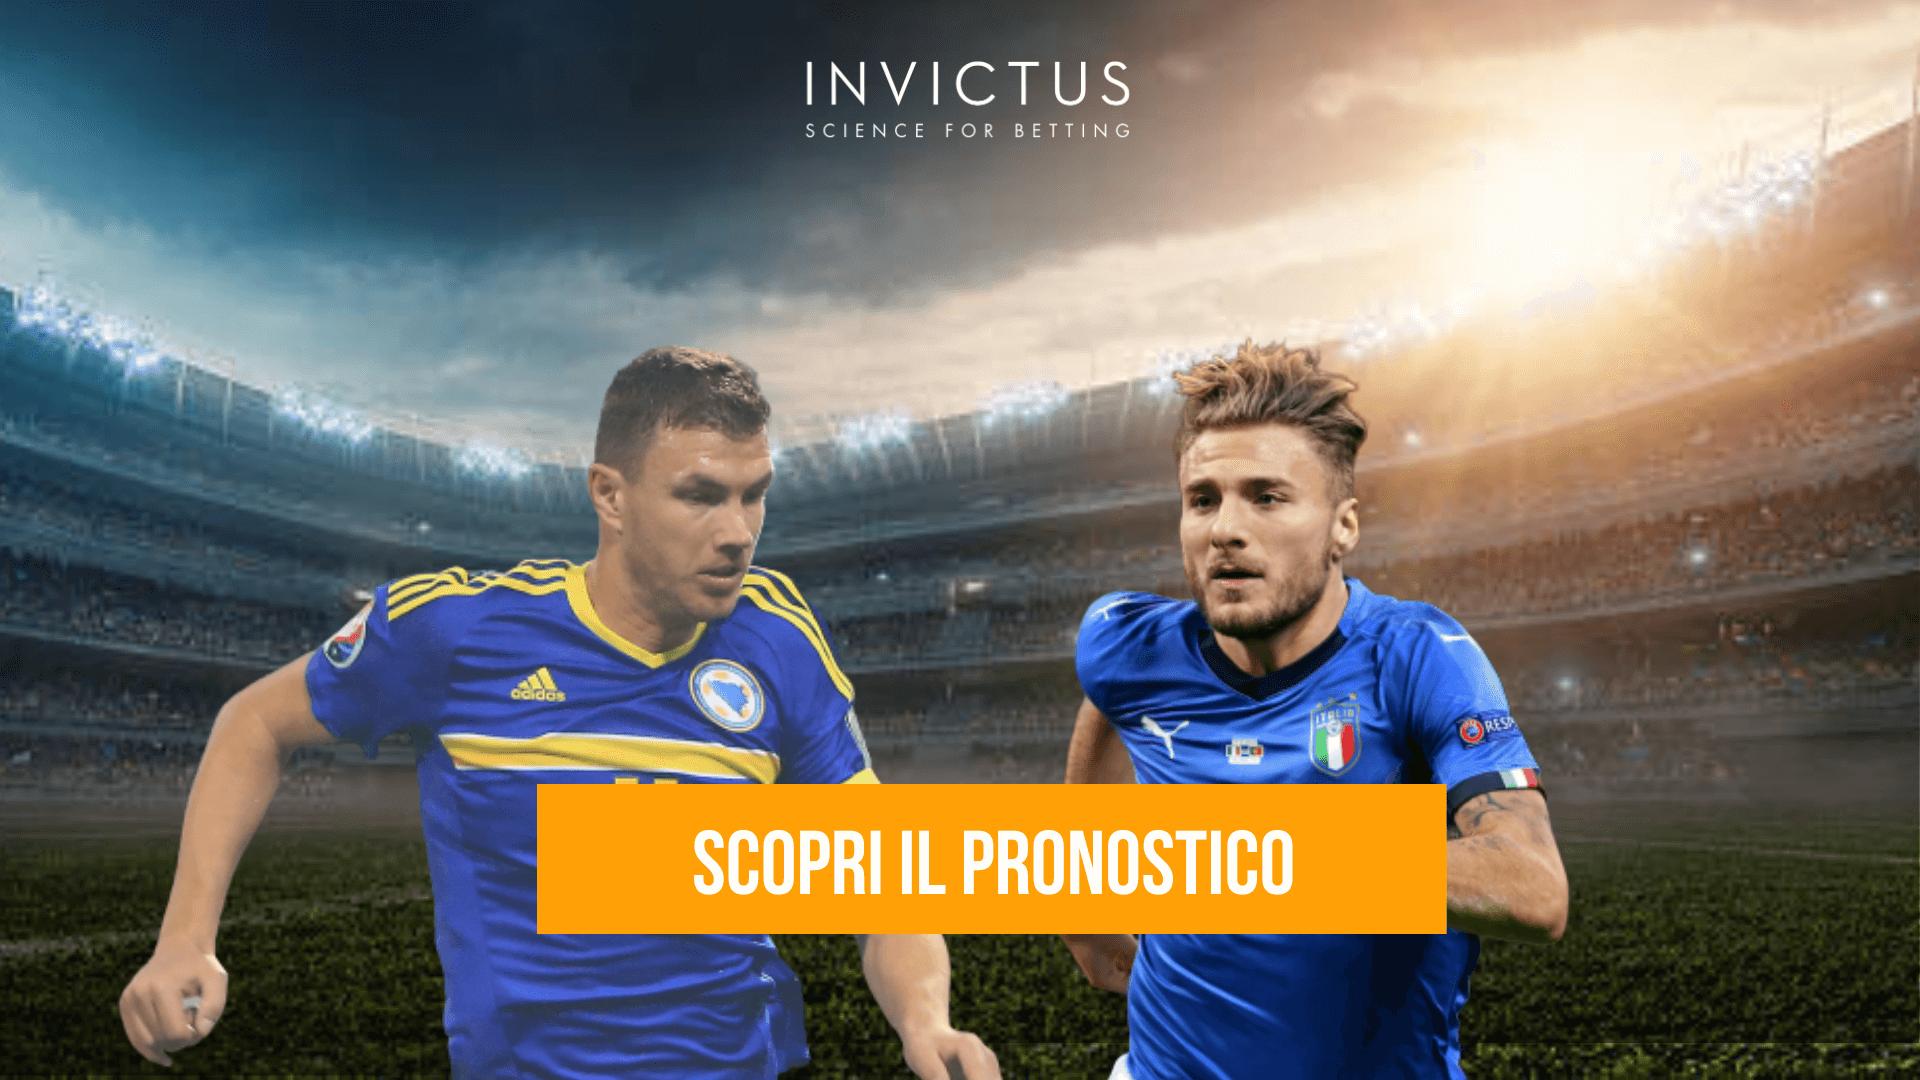 Pronostico Bosnia - Italia Nations League - Invictus Blog